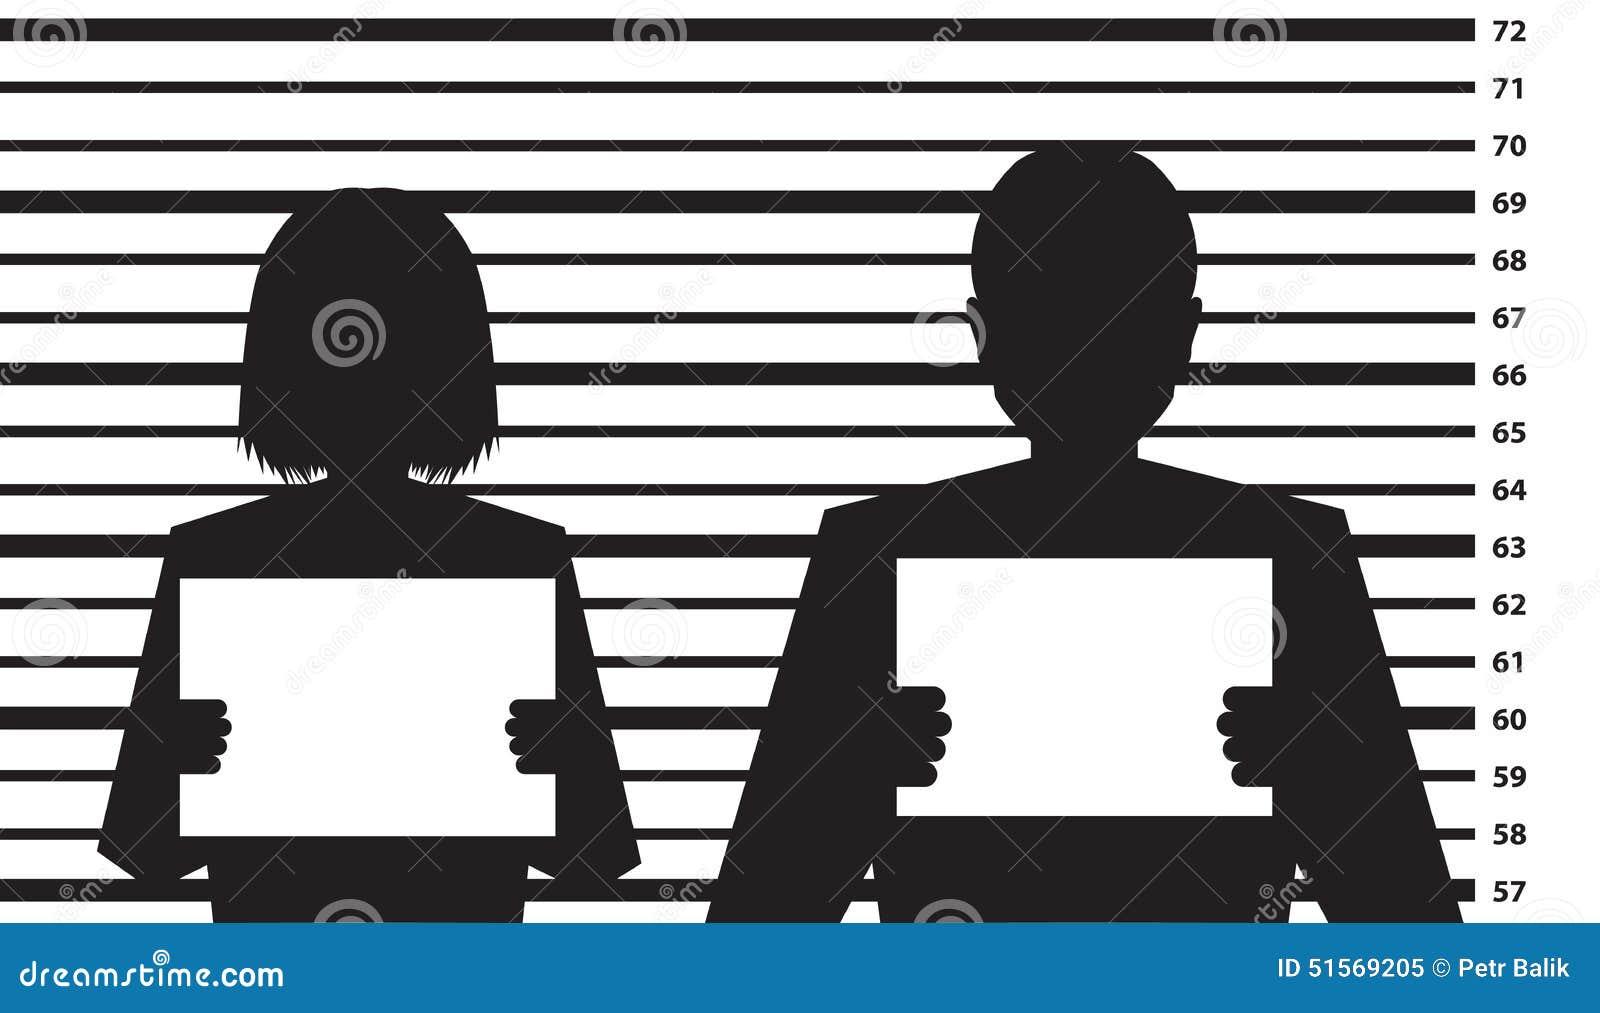 criminal record template thebridgesummitco